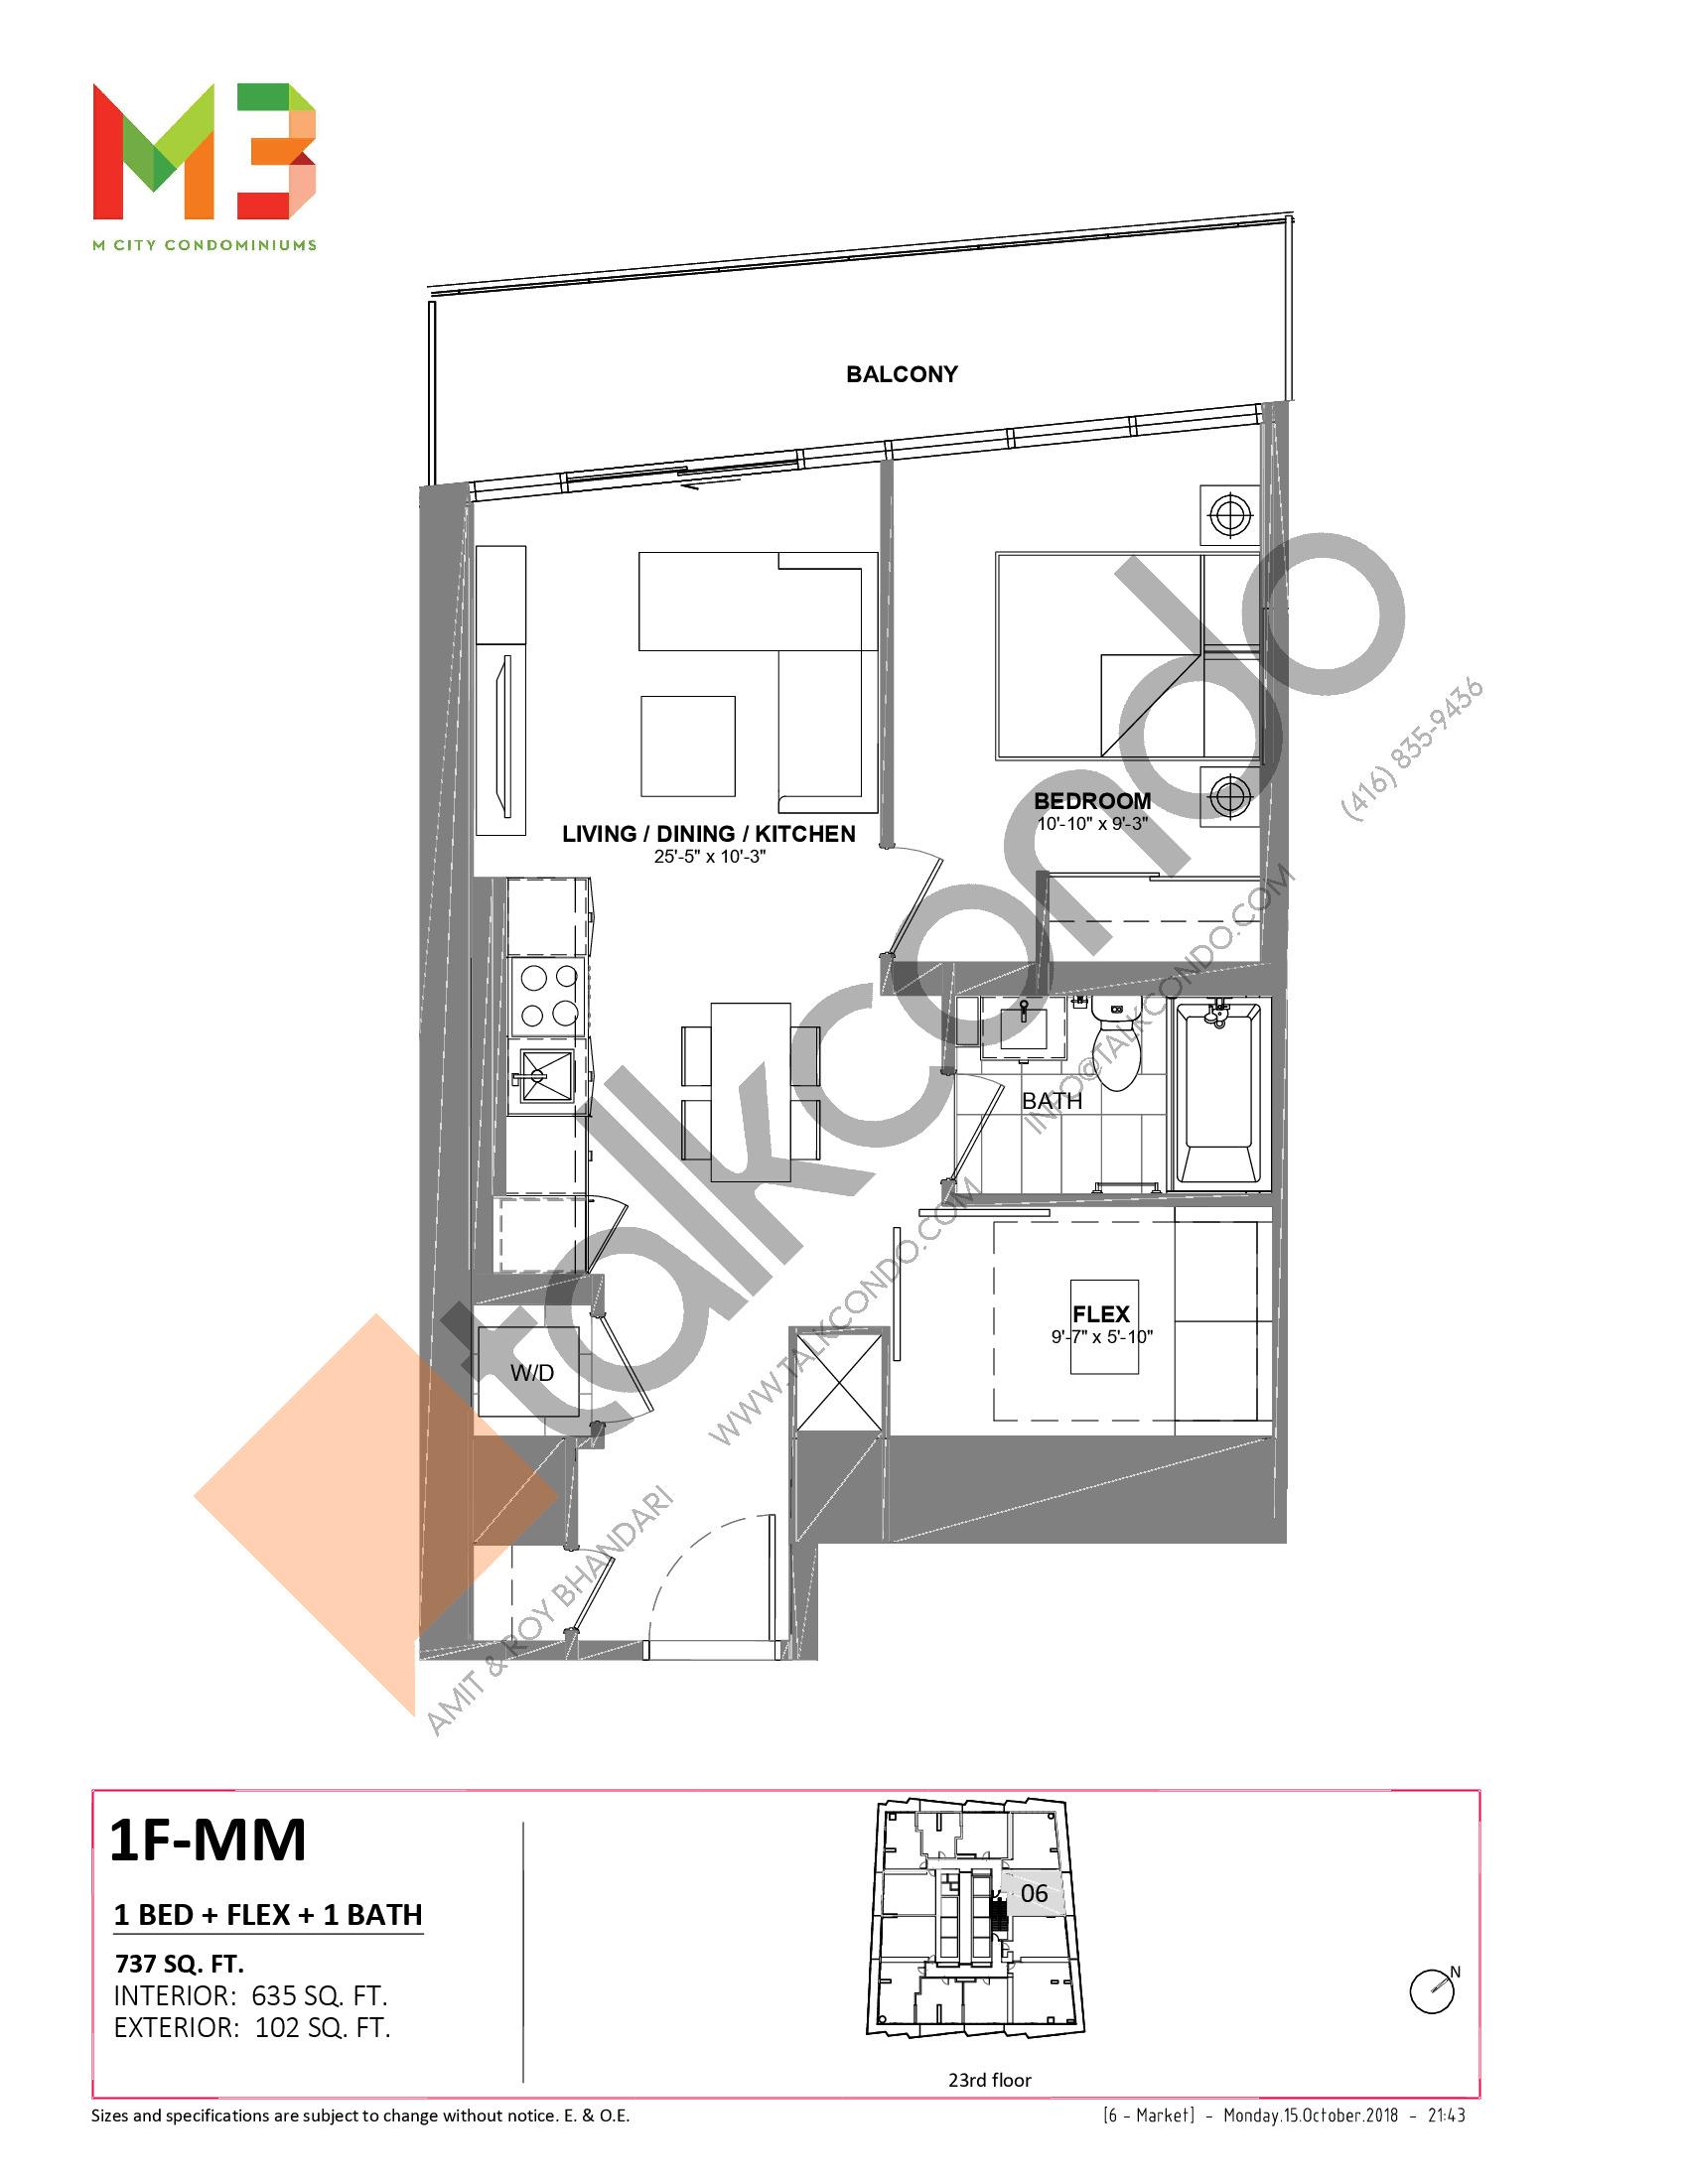 1F-MM Floor Plan at M3 Condos - 635 sq.ft